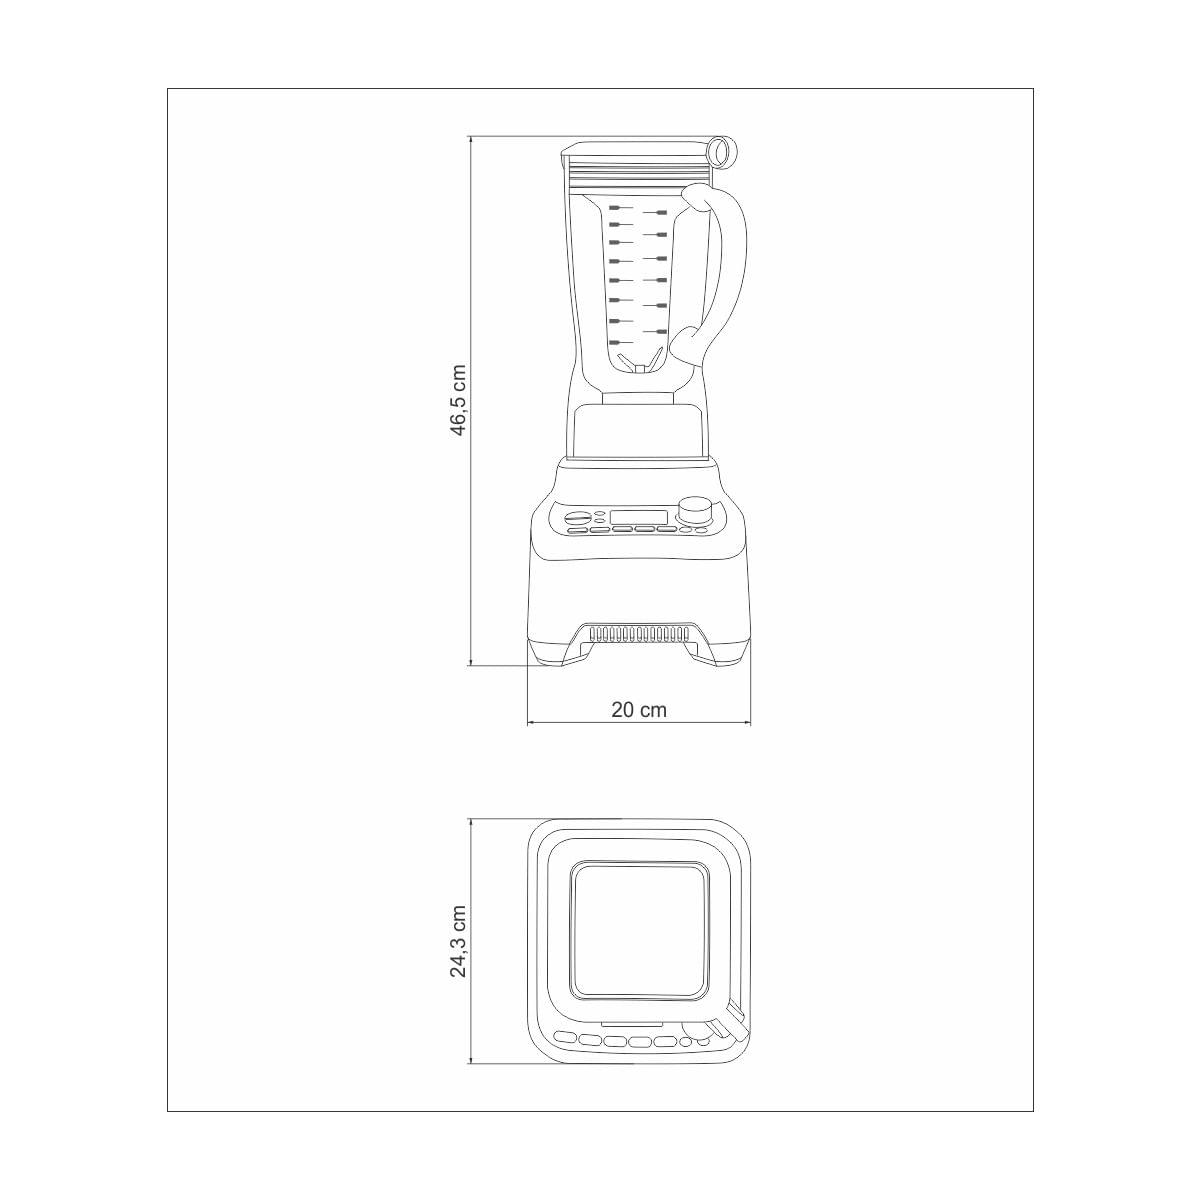 Liquidificador Tramontina by Breville Pro Chef em Alumínio Fundido Fosco com Copo de Tritan 2 L 2000 W